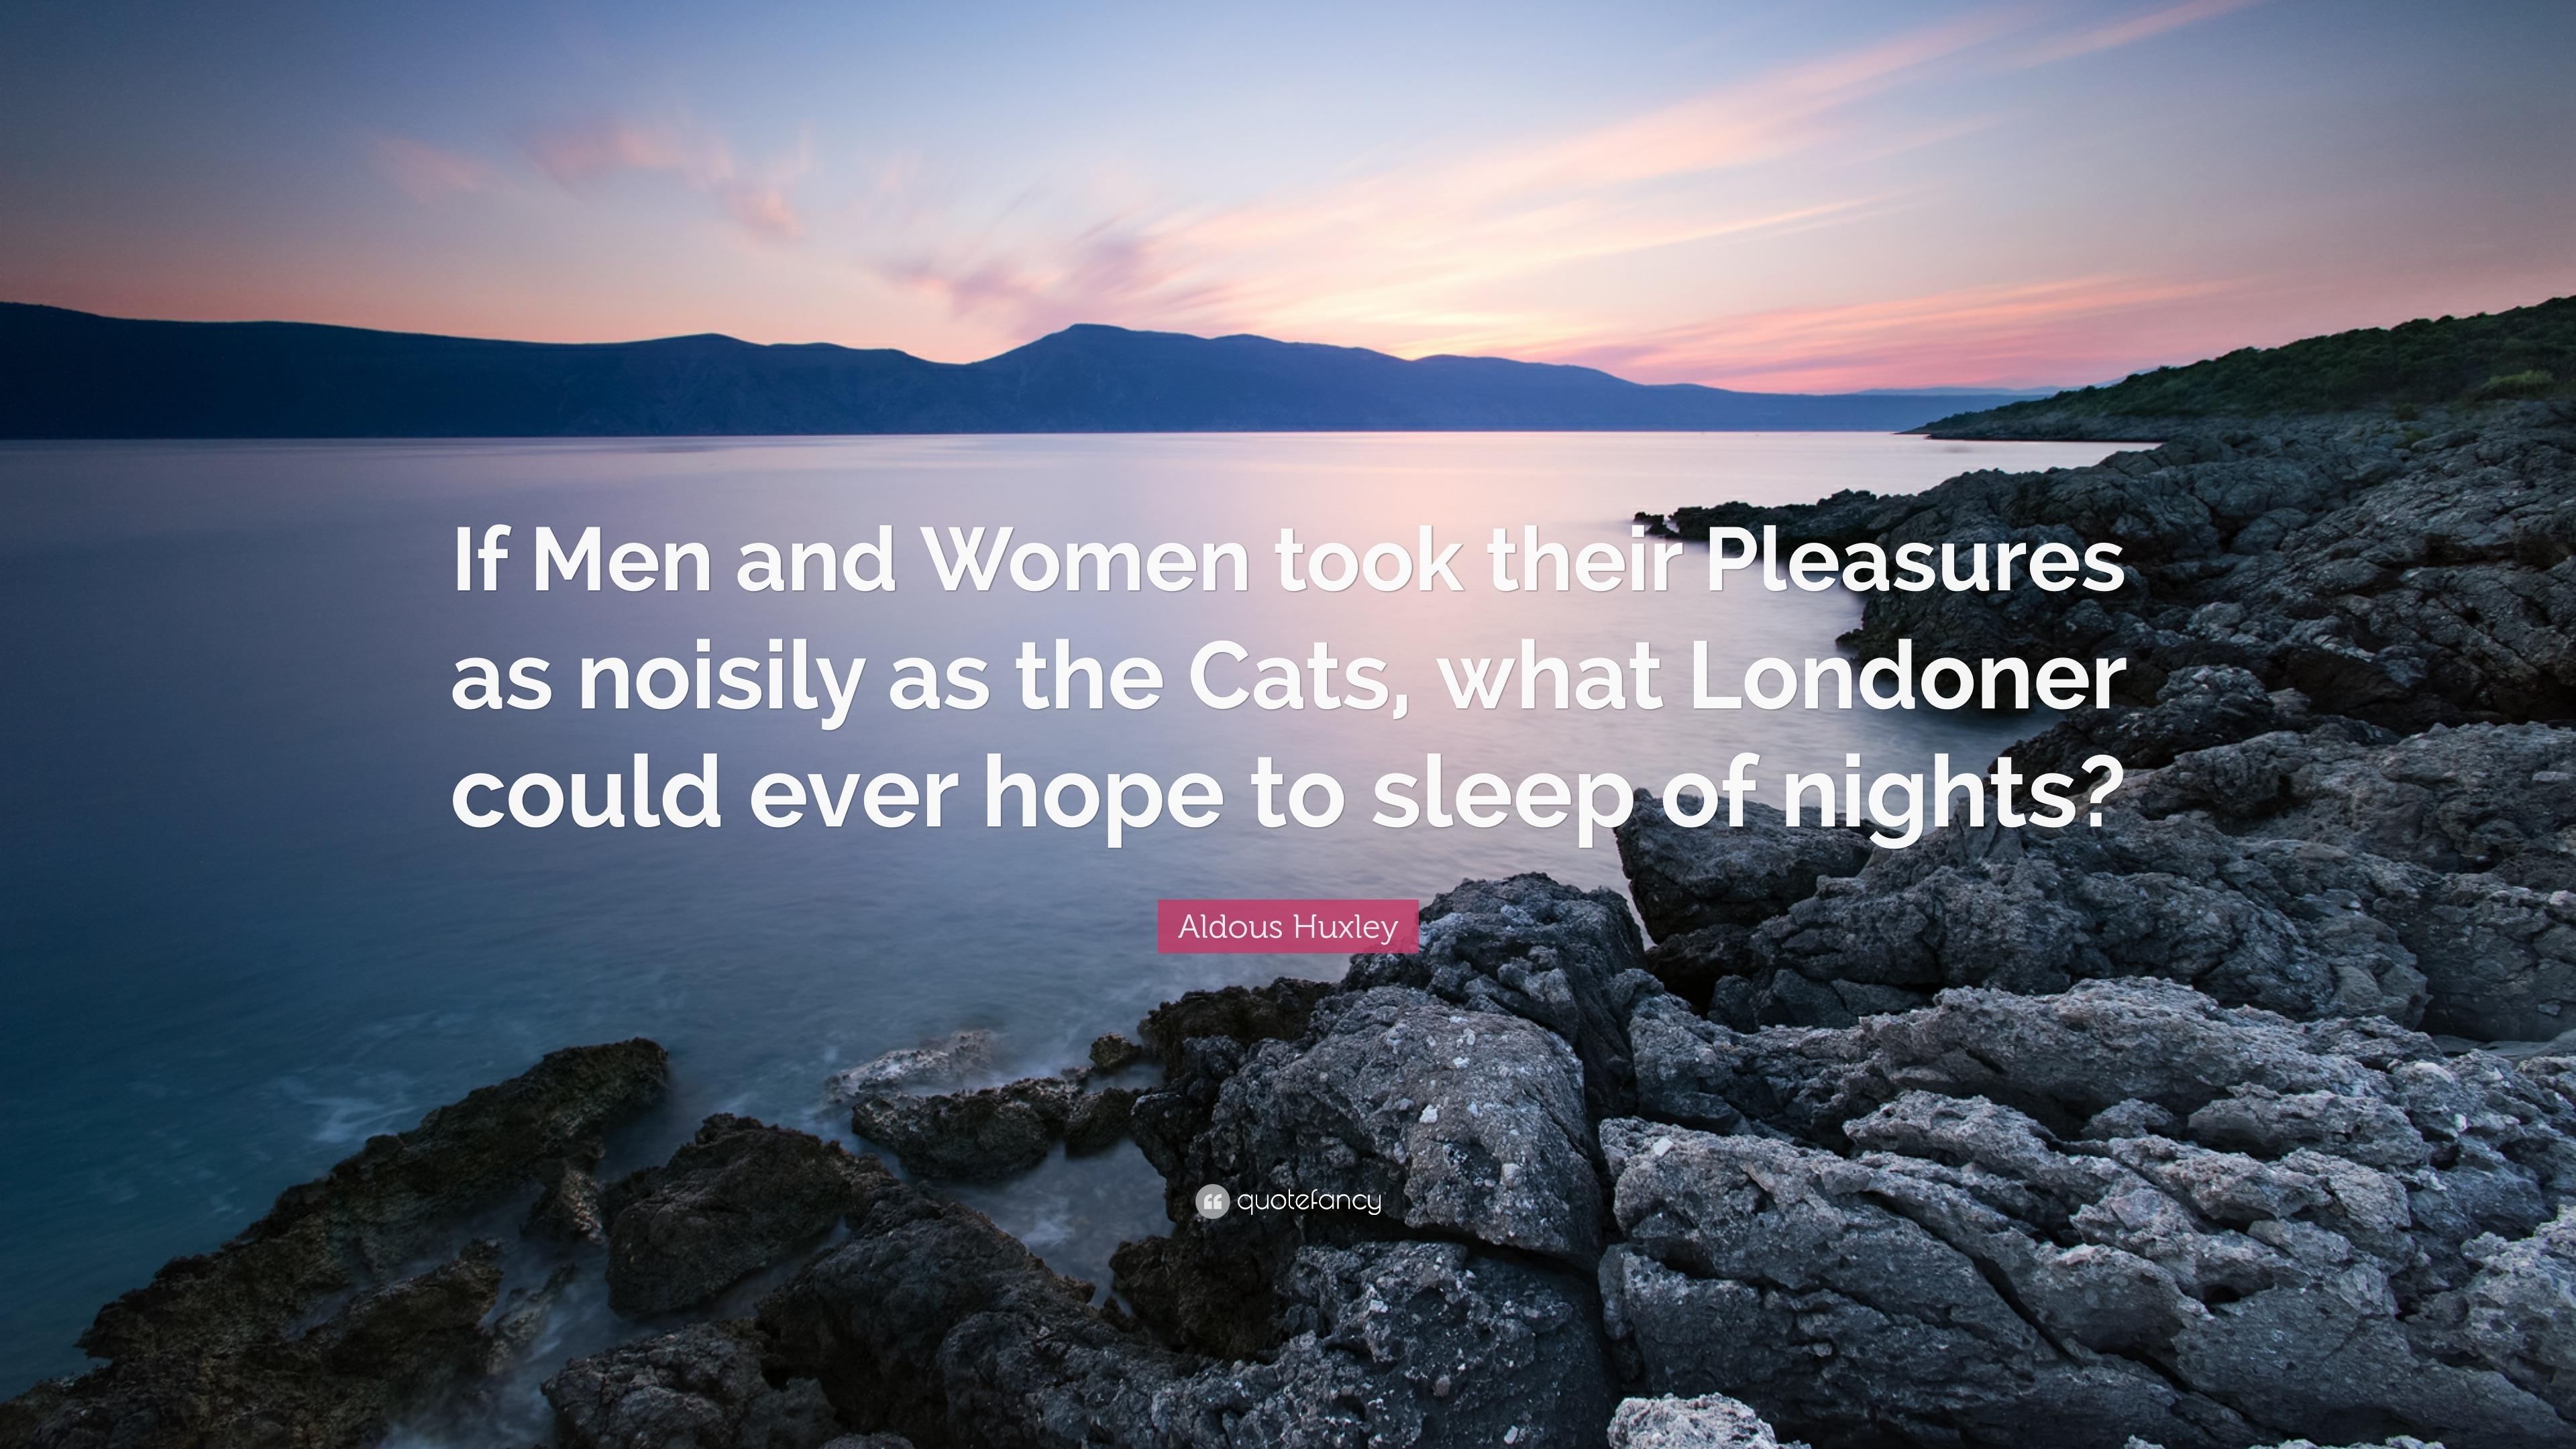 Women are a pleasure tolstoy quote